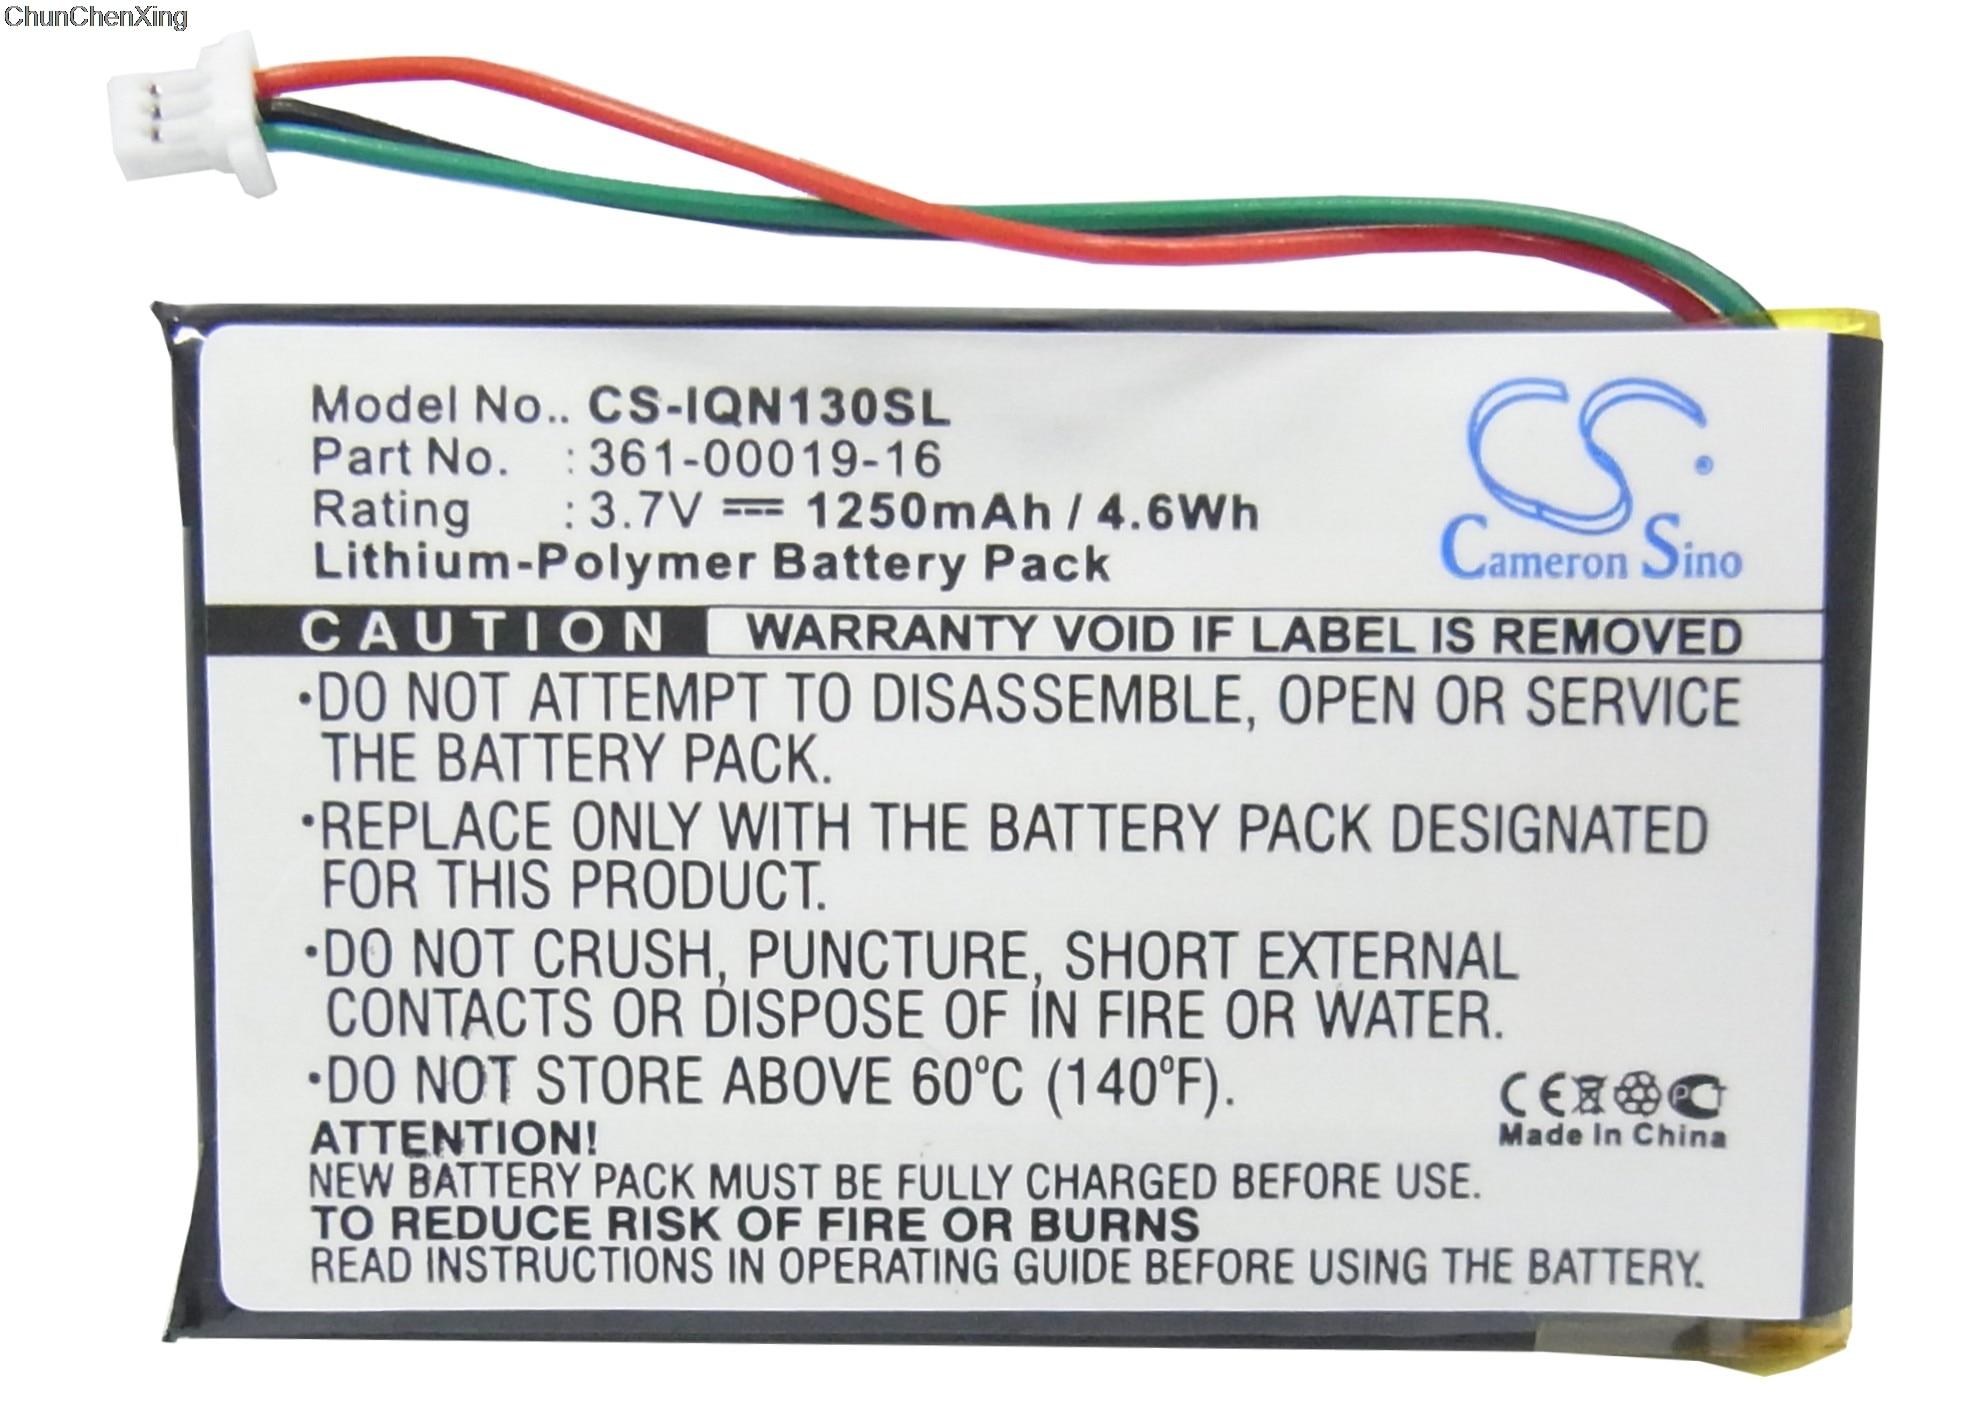 Cameron Sino 1250mAh Battery 361-00019-16 For Garmin Nuvi 1300, 1340T Pro, 1350, 1350T, 1370, 1370T, 1375T, 1390, 1390T, 1490